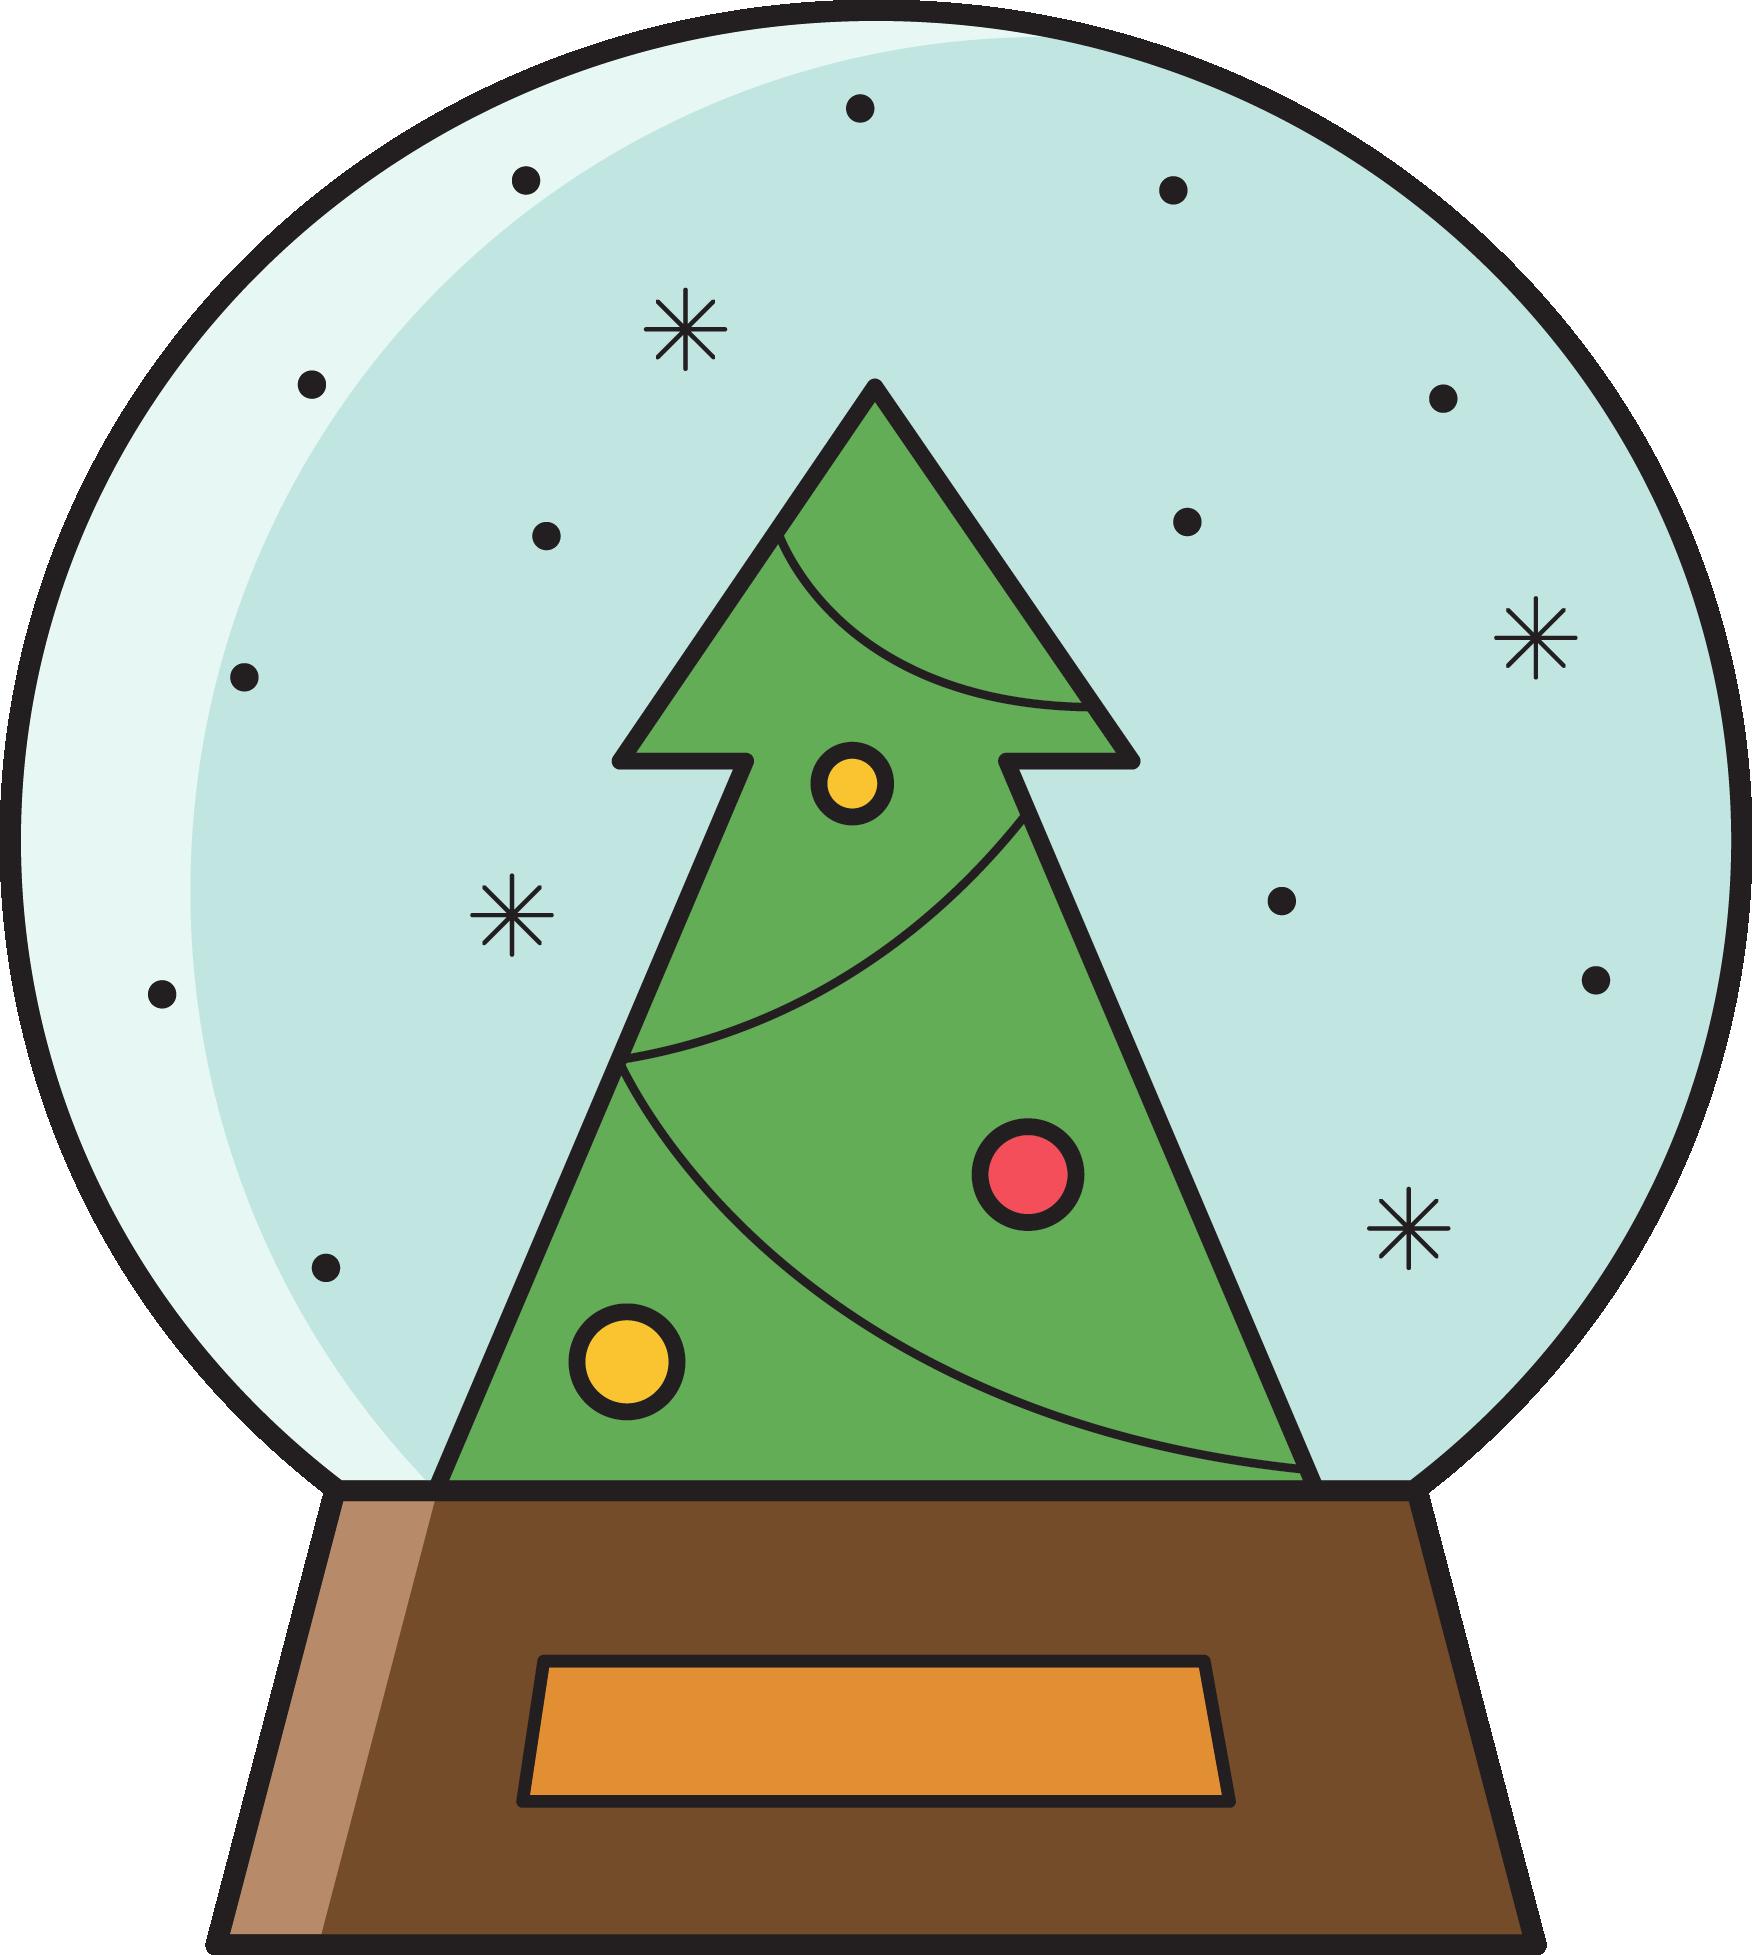 Tree circle clipart clip transparent download Snow Globe Clipart | Free download best Snow Globe Clipart on ... clip transparent download